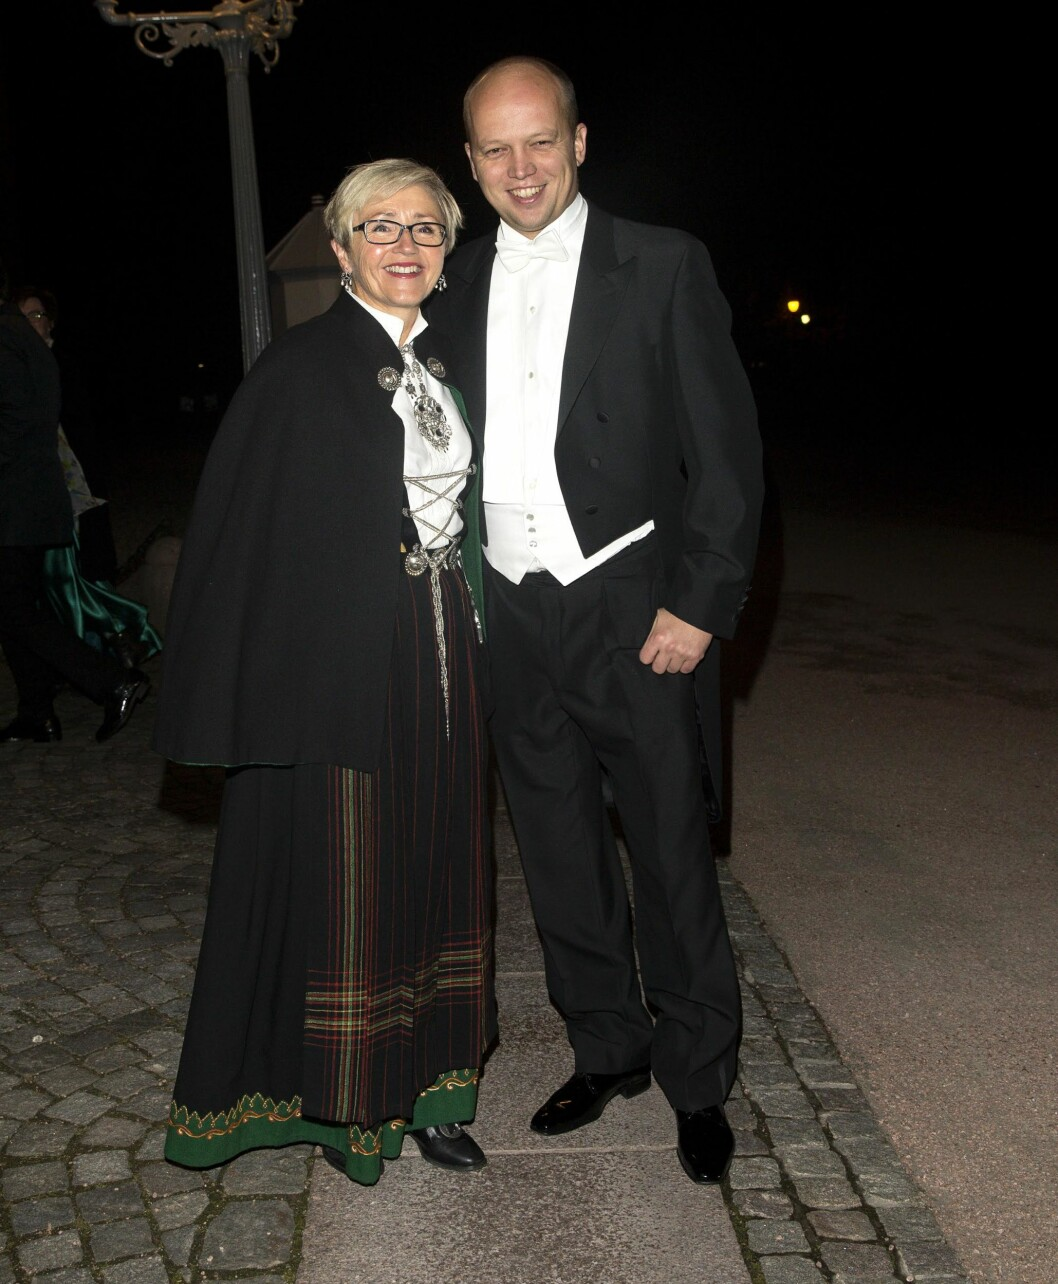 SAVNET KONA: Sp-leder Trygve Slagsvold Vedum ankom sammen med partikollega Liv Signe Navarsete. Foto: Andreas Fadum/Se og Hør